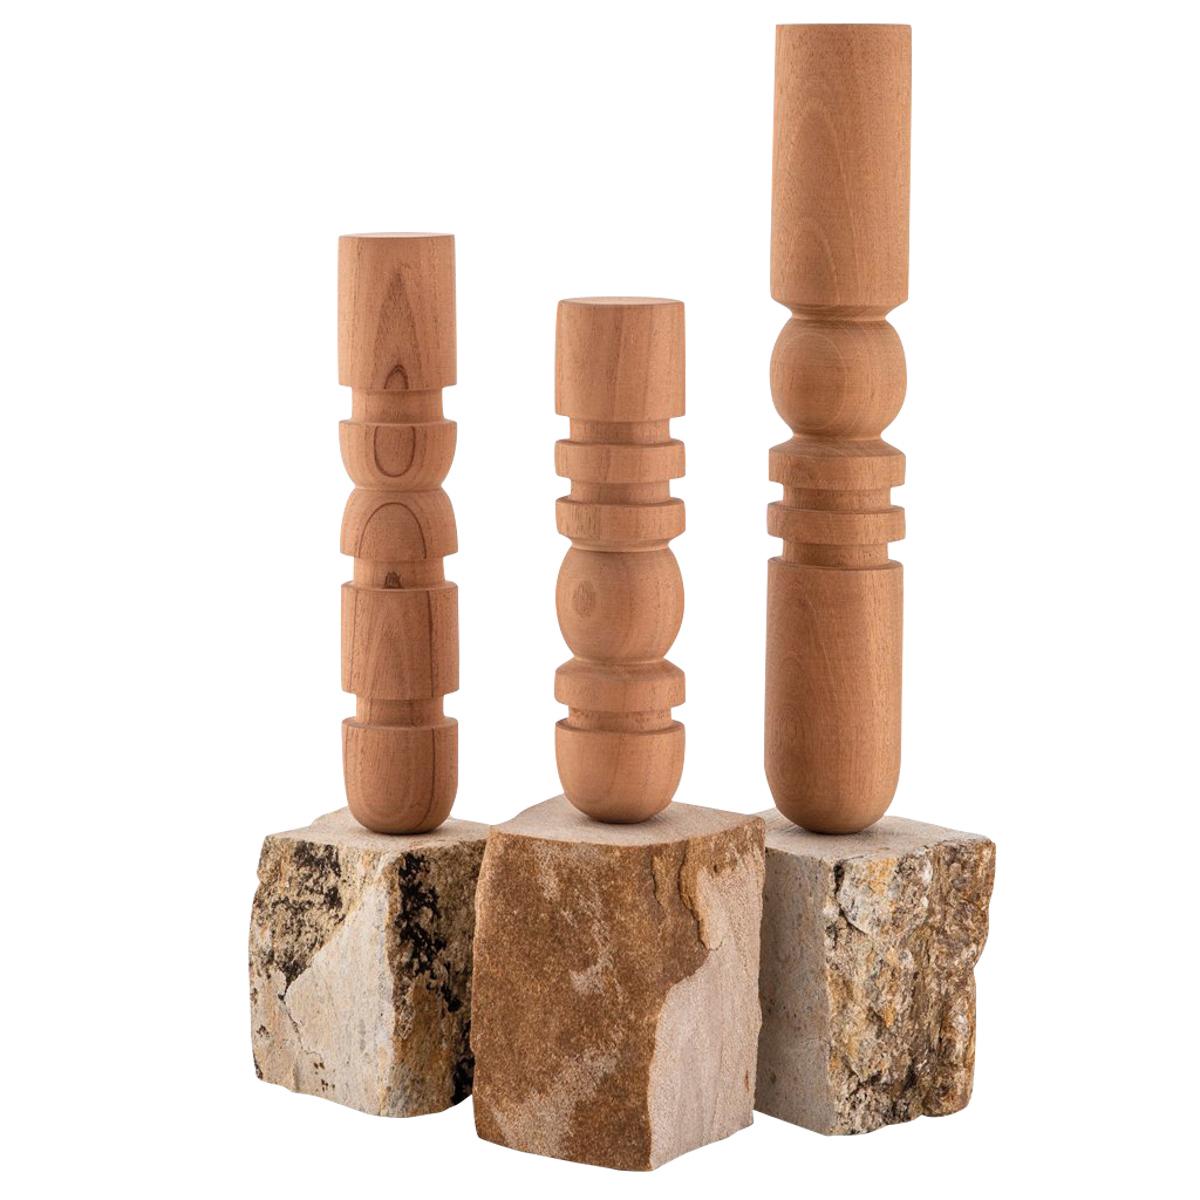 Stone Candlesticks